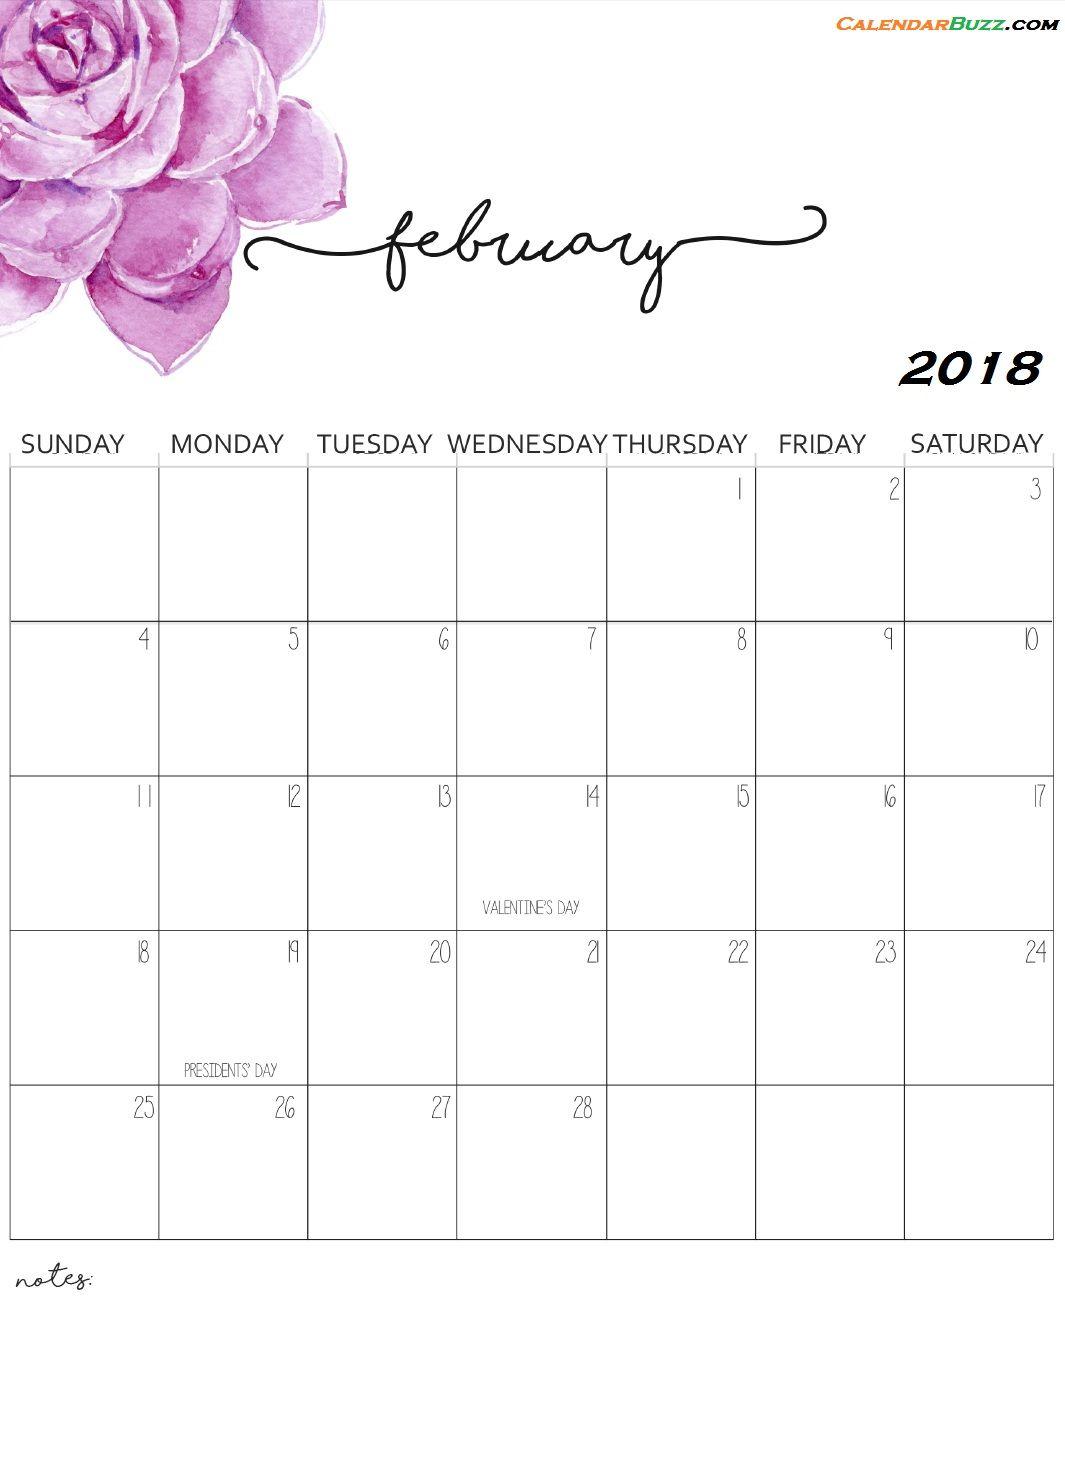 Monthly Wall Calendar 2018 February